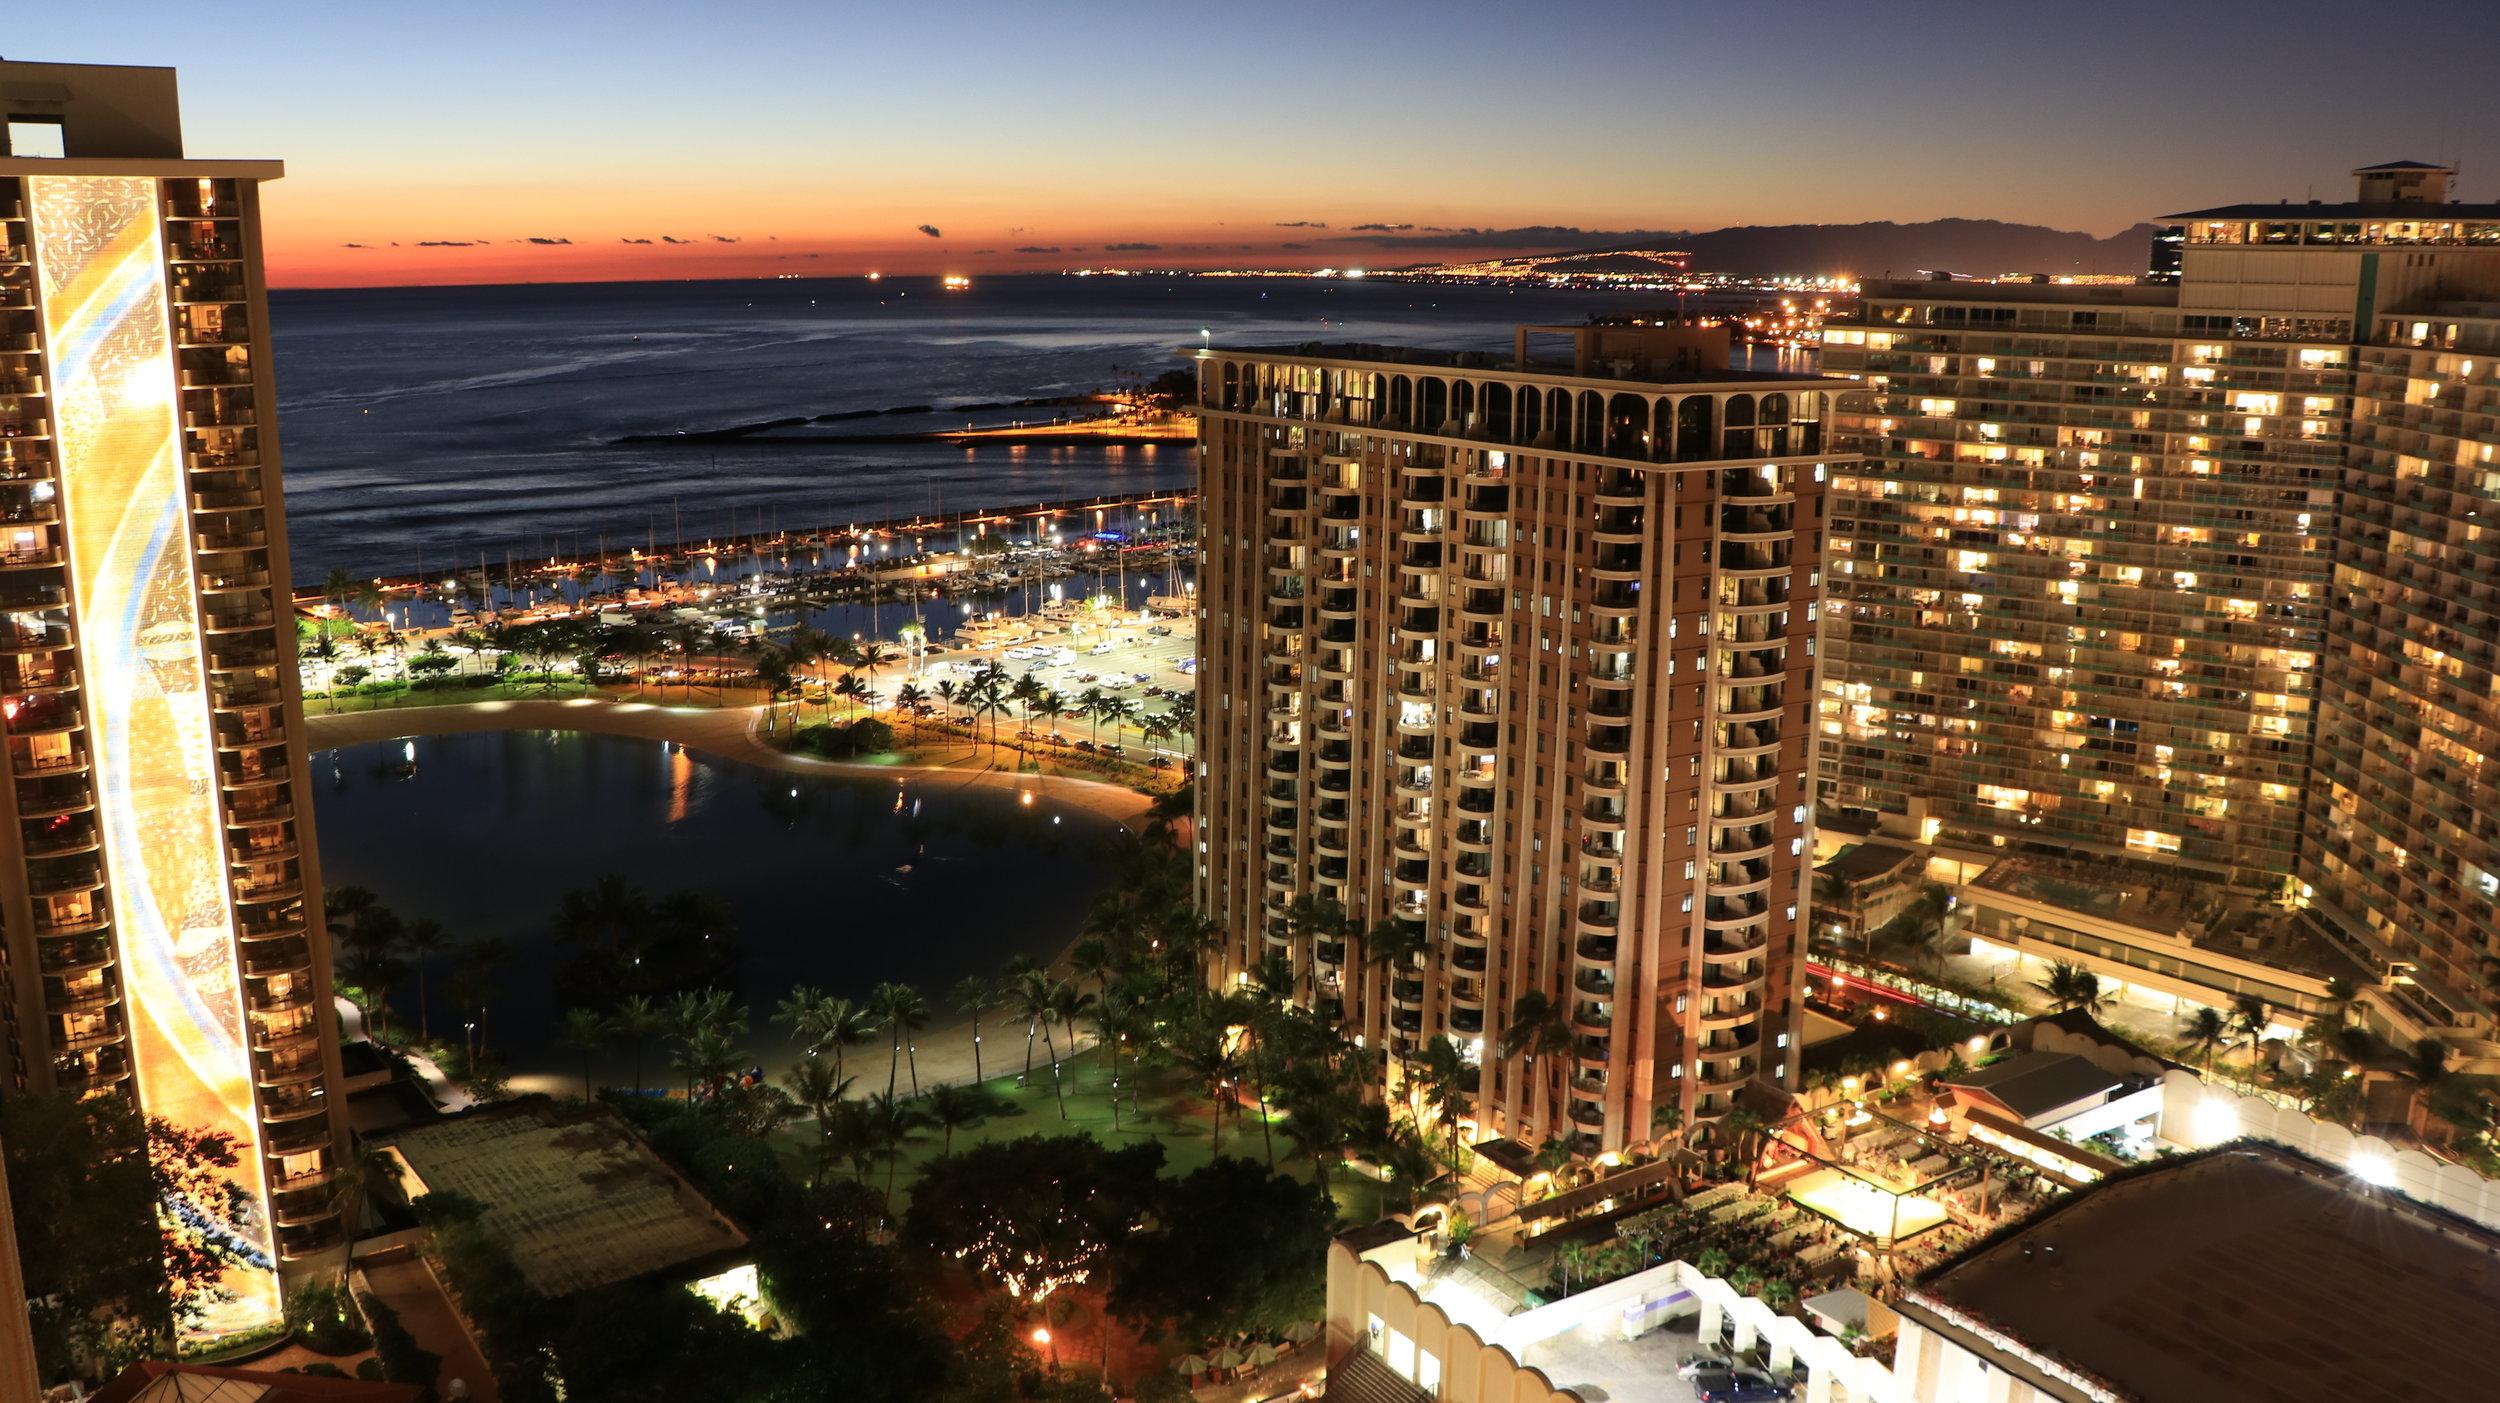 Night Scene - Honolulu, HI